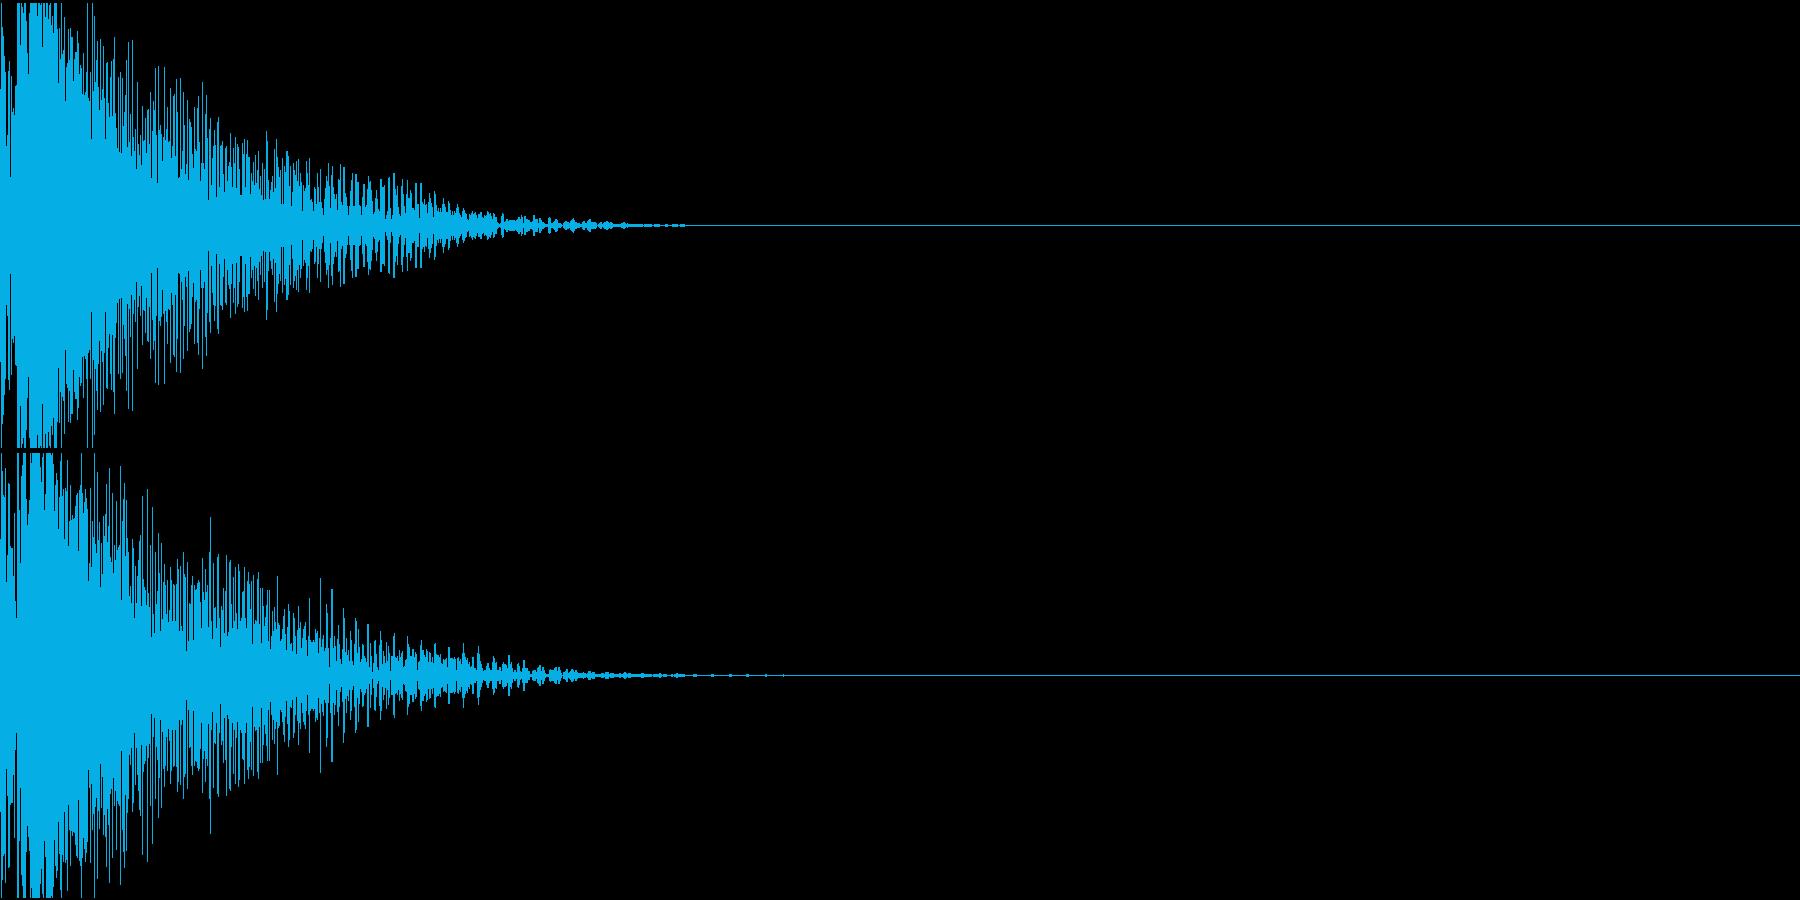 LaserGun レーザーガン 銃撃音の再生済みの波形